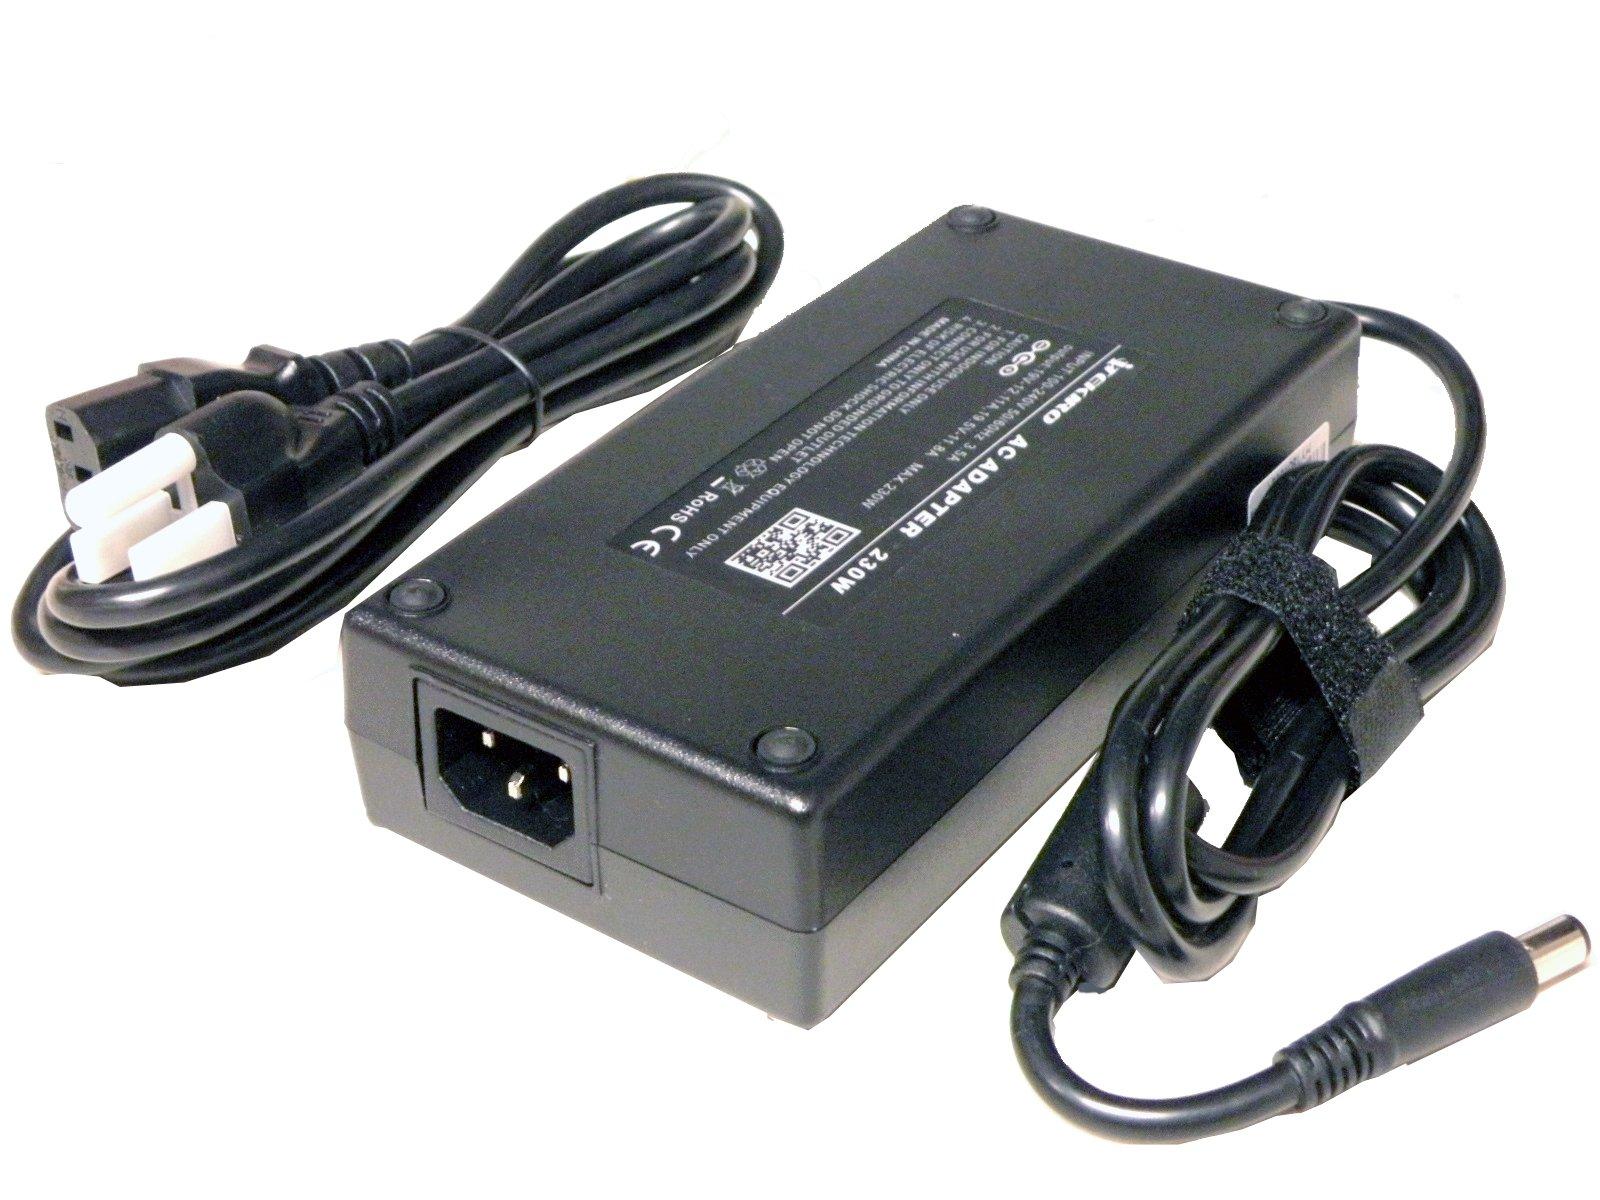 iTEKIRO 230W AC Adapter for MSI GP63, GP63 Leopard-428; GE63, GE63 Raider RGB-010/RGB-025; GE73, GE73 Raider RGB-012; GP73, GP73 Leopard-209; VR ONE 7RD-067US/7RE-065US; MSI ADP-230W-PWD-USA